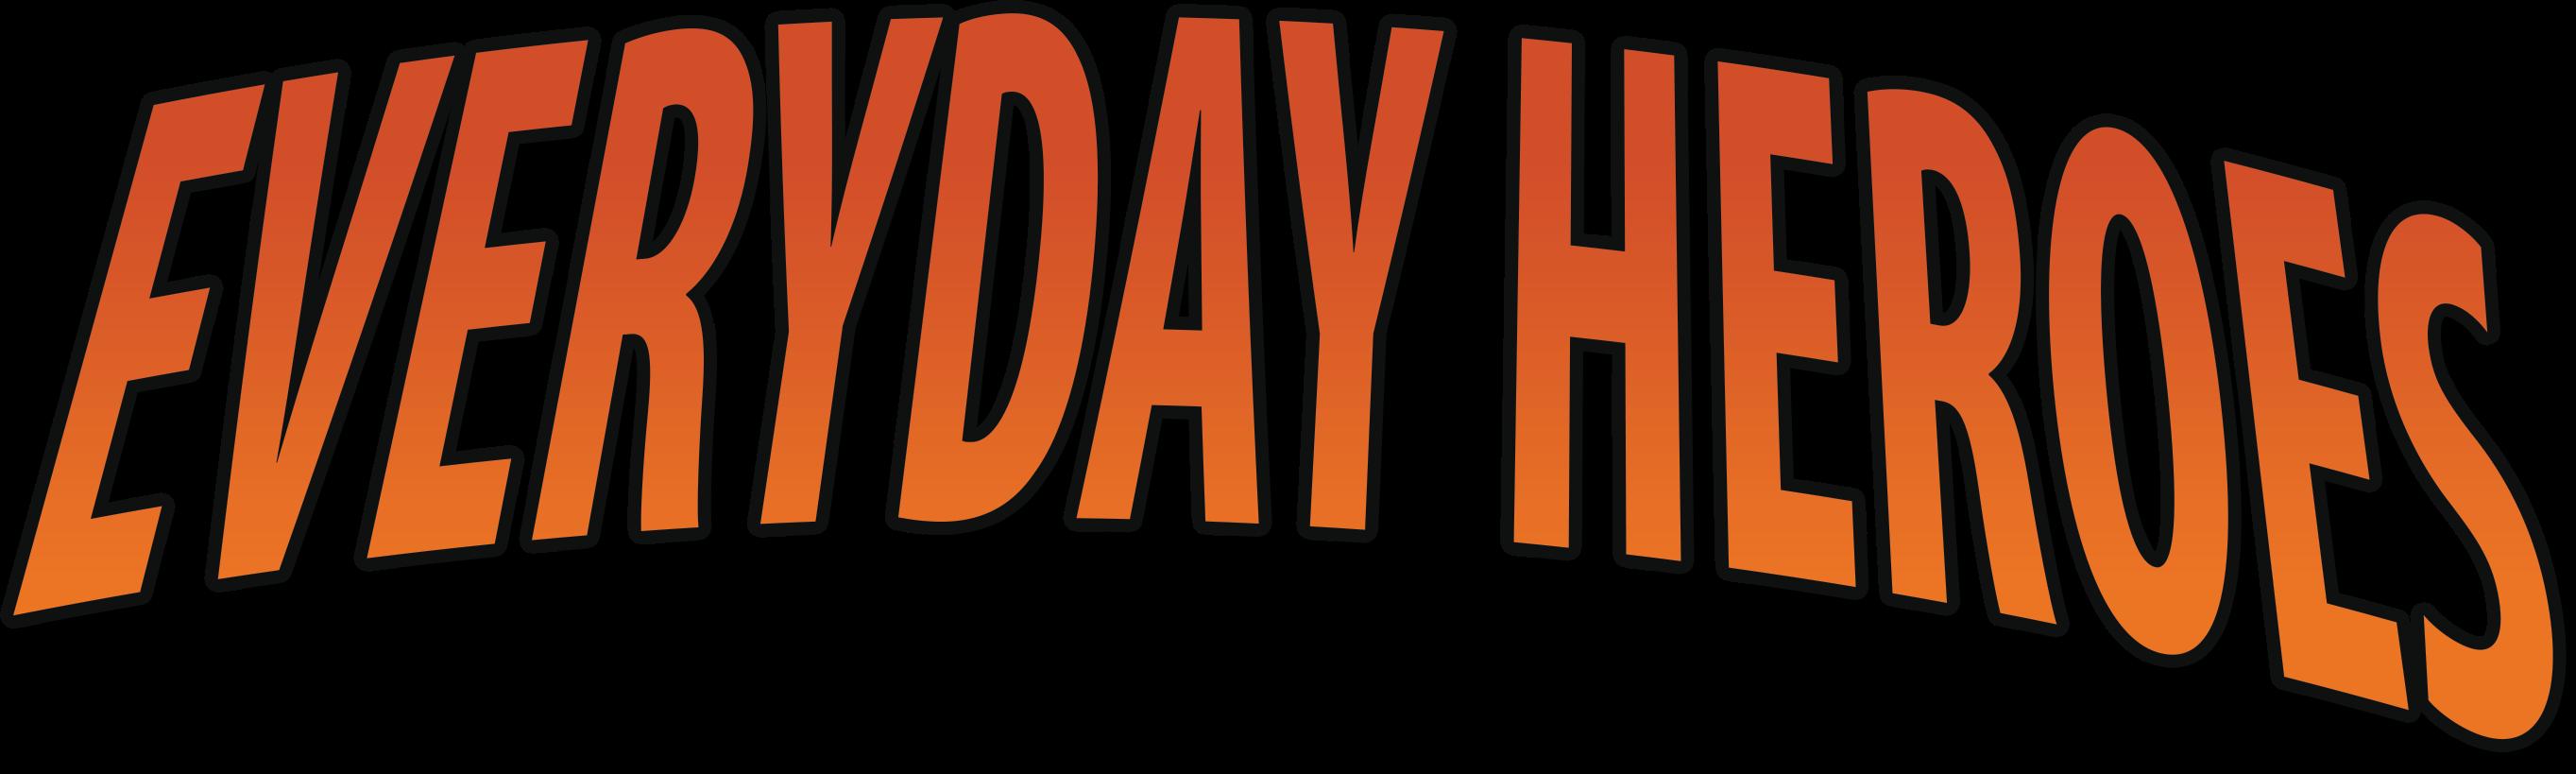 Everyday Heroes logo